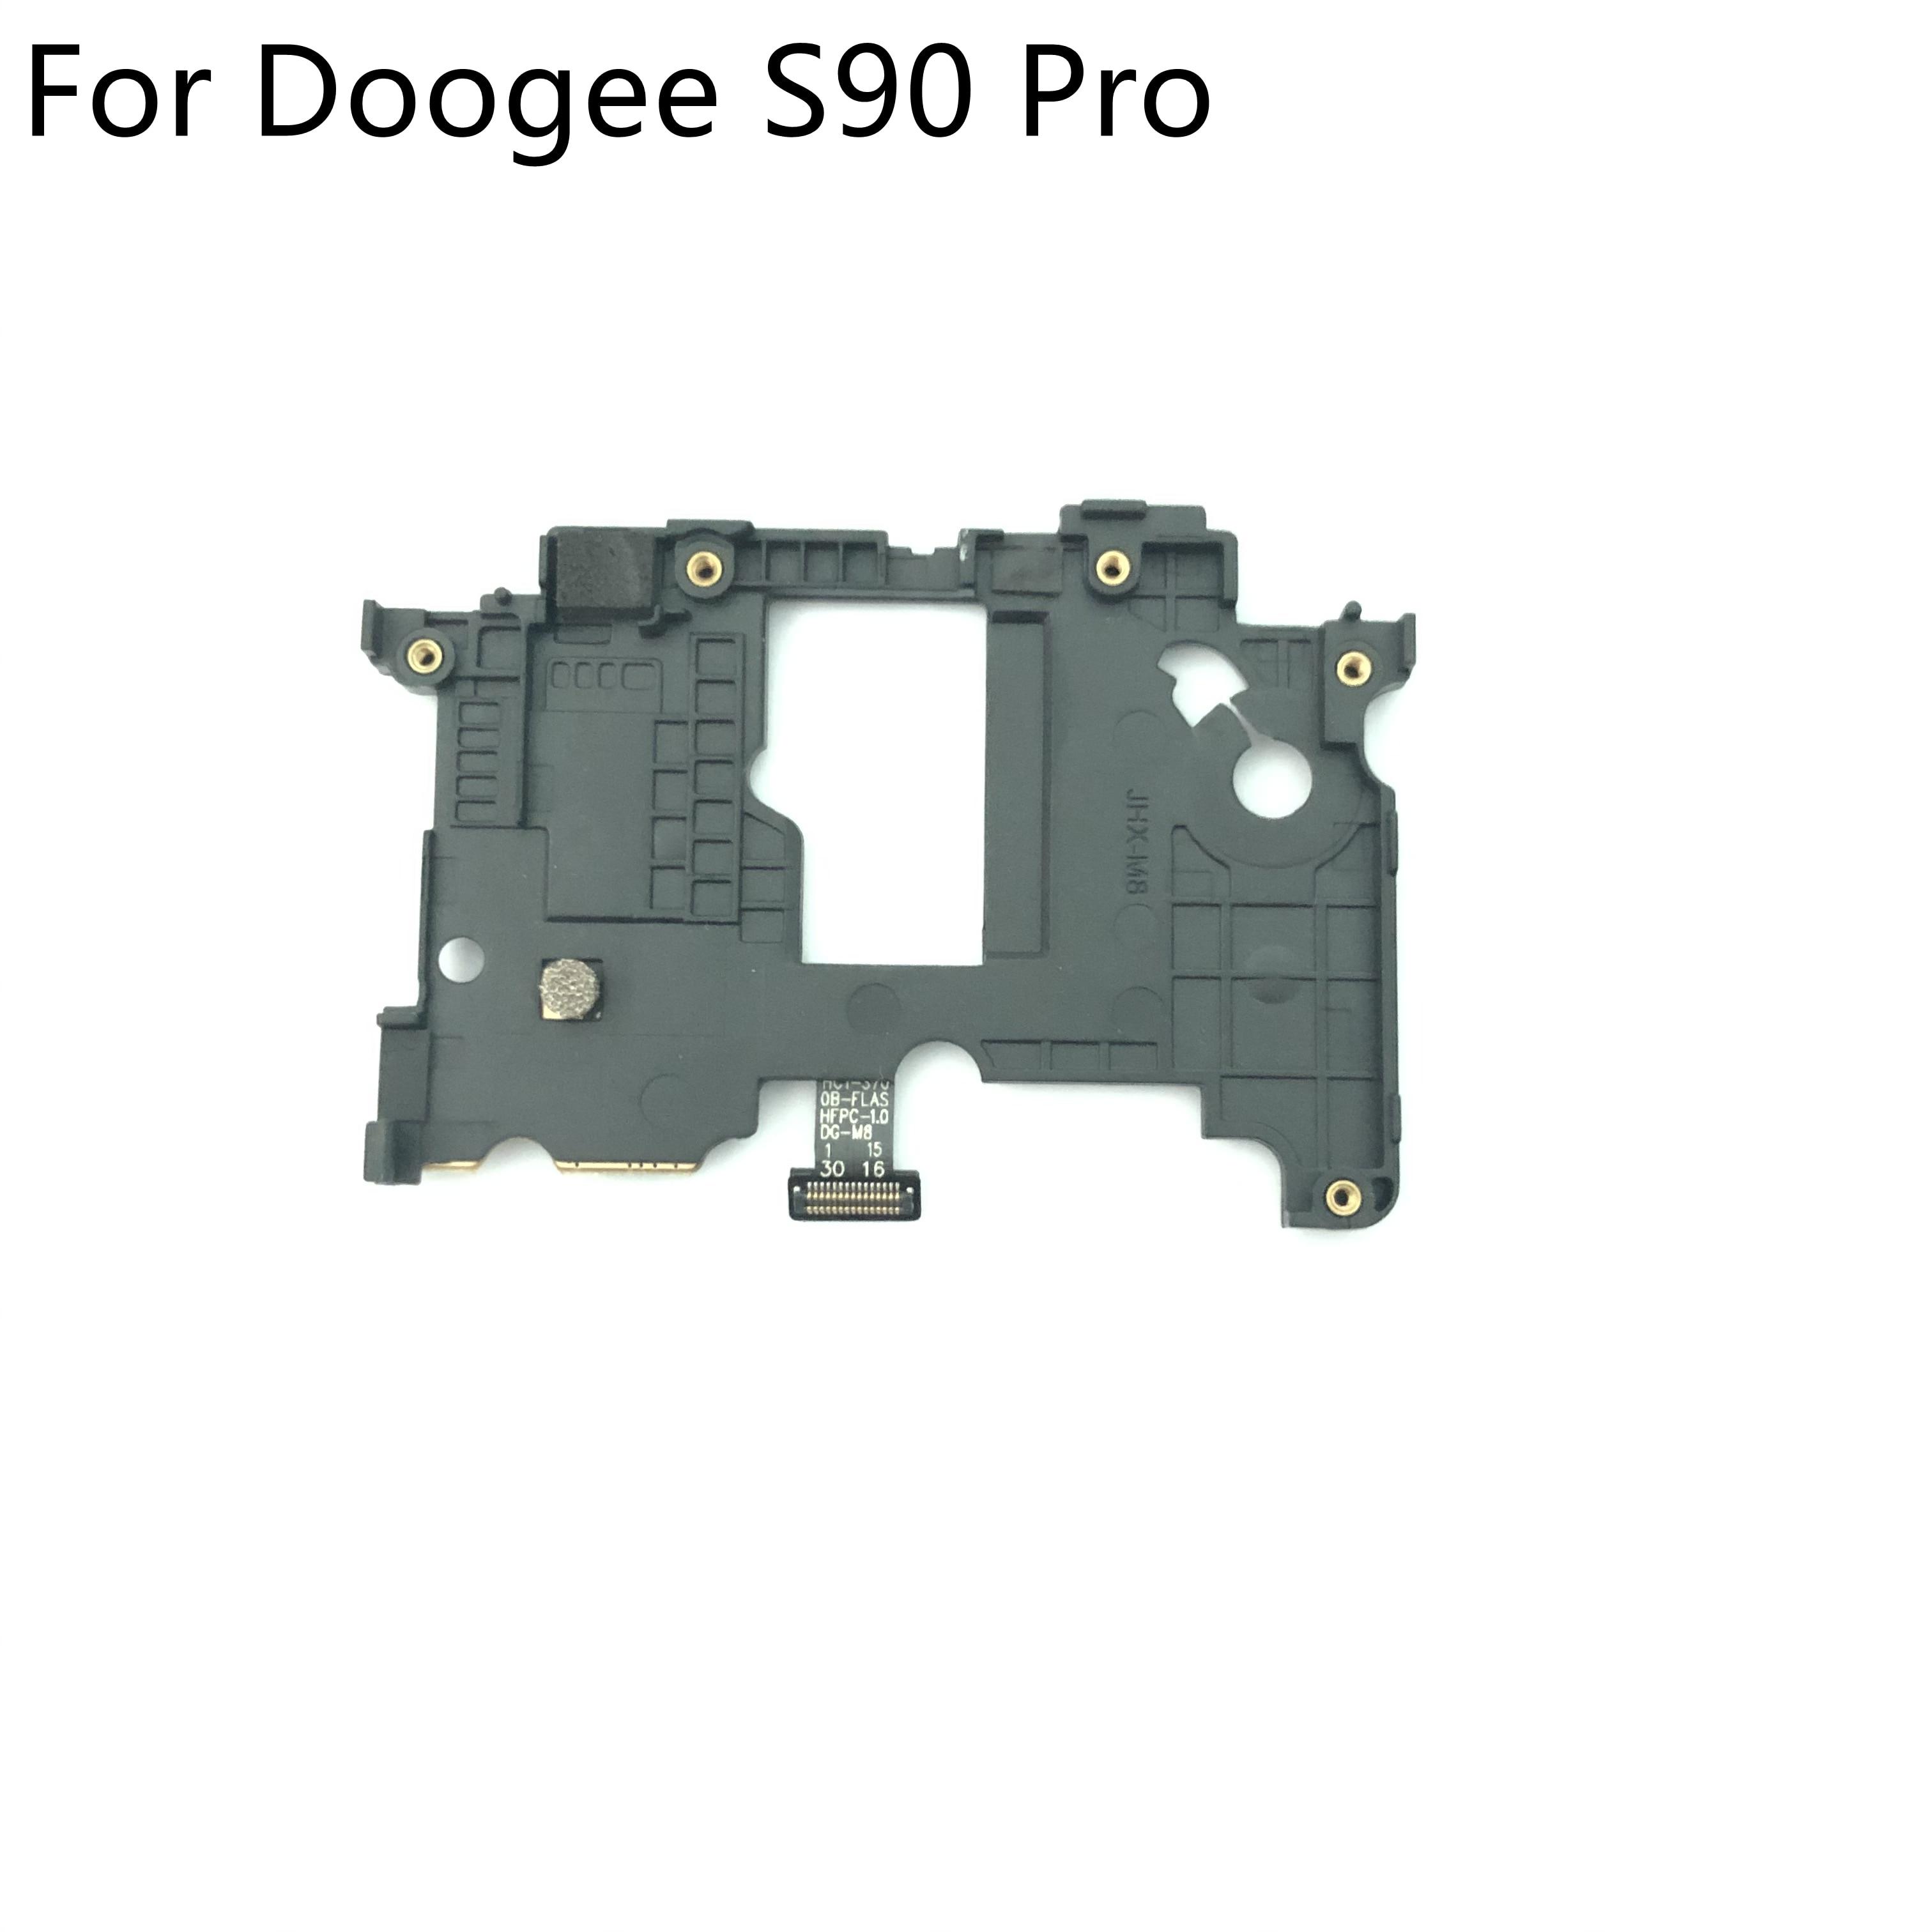 "Doogee s90 pro usado back frame caso escudo para doogee s90 pro mt6771 córtex 2246*1080 6.18 ""smartphone"